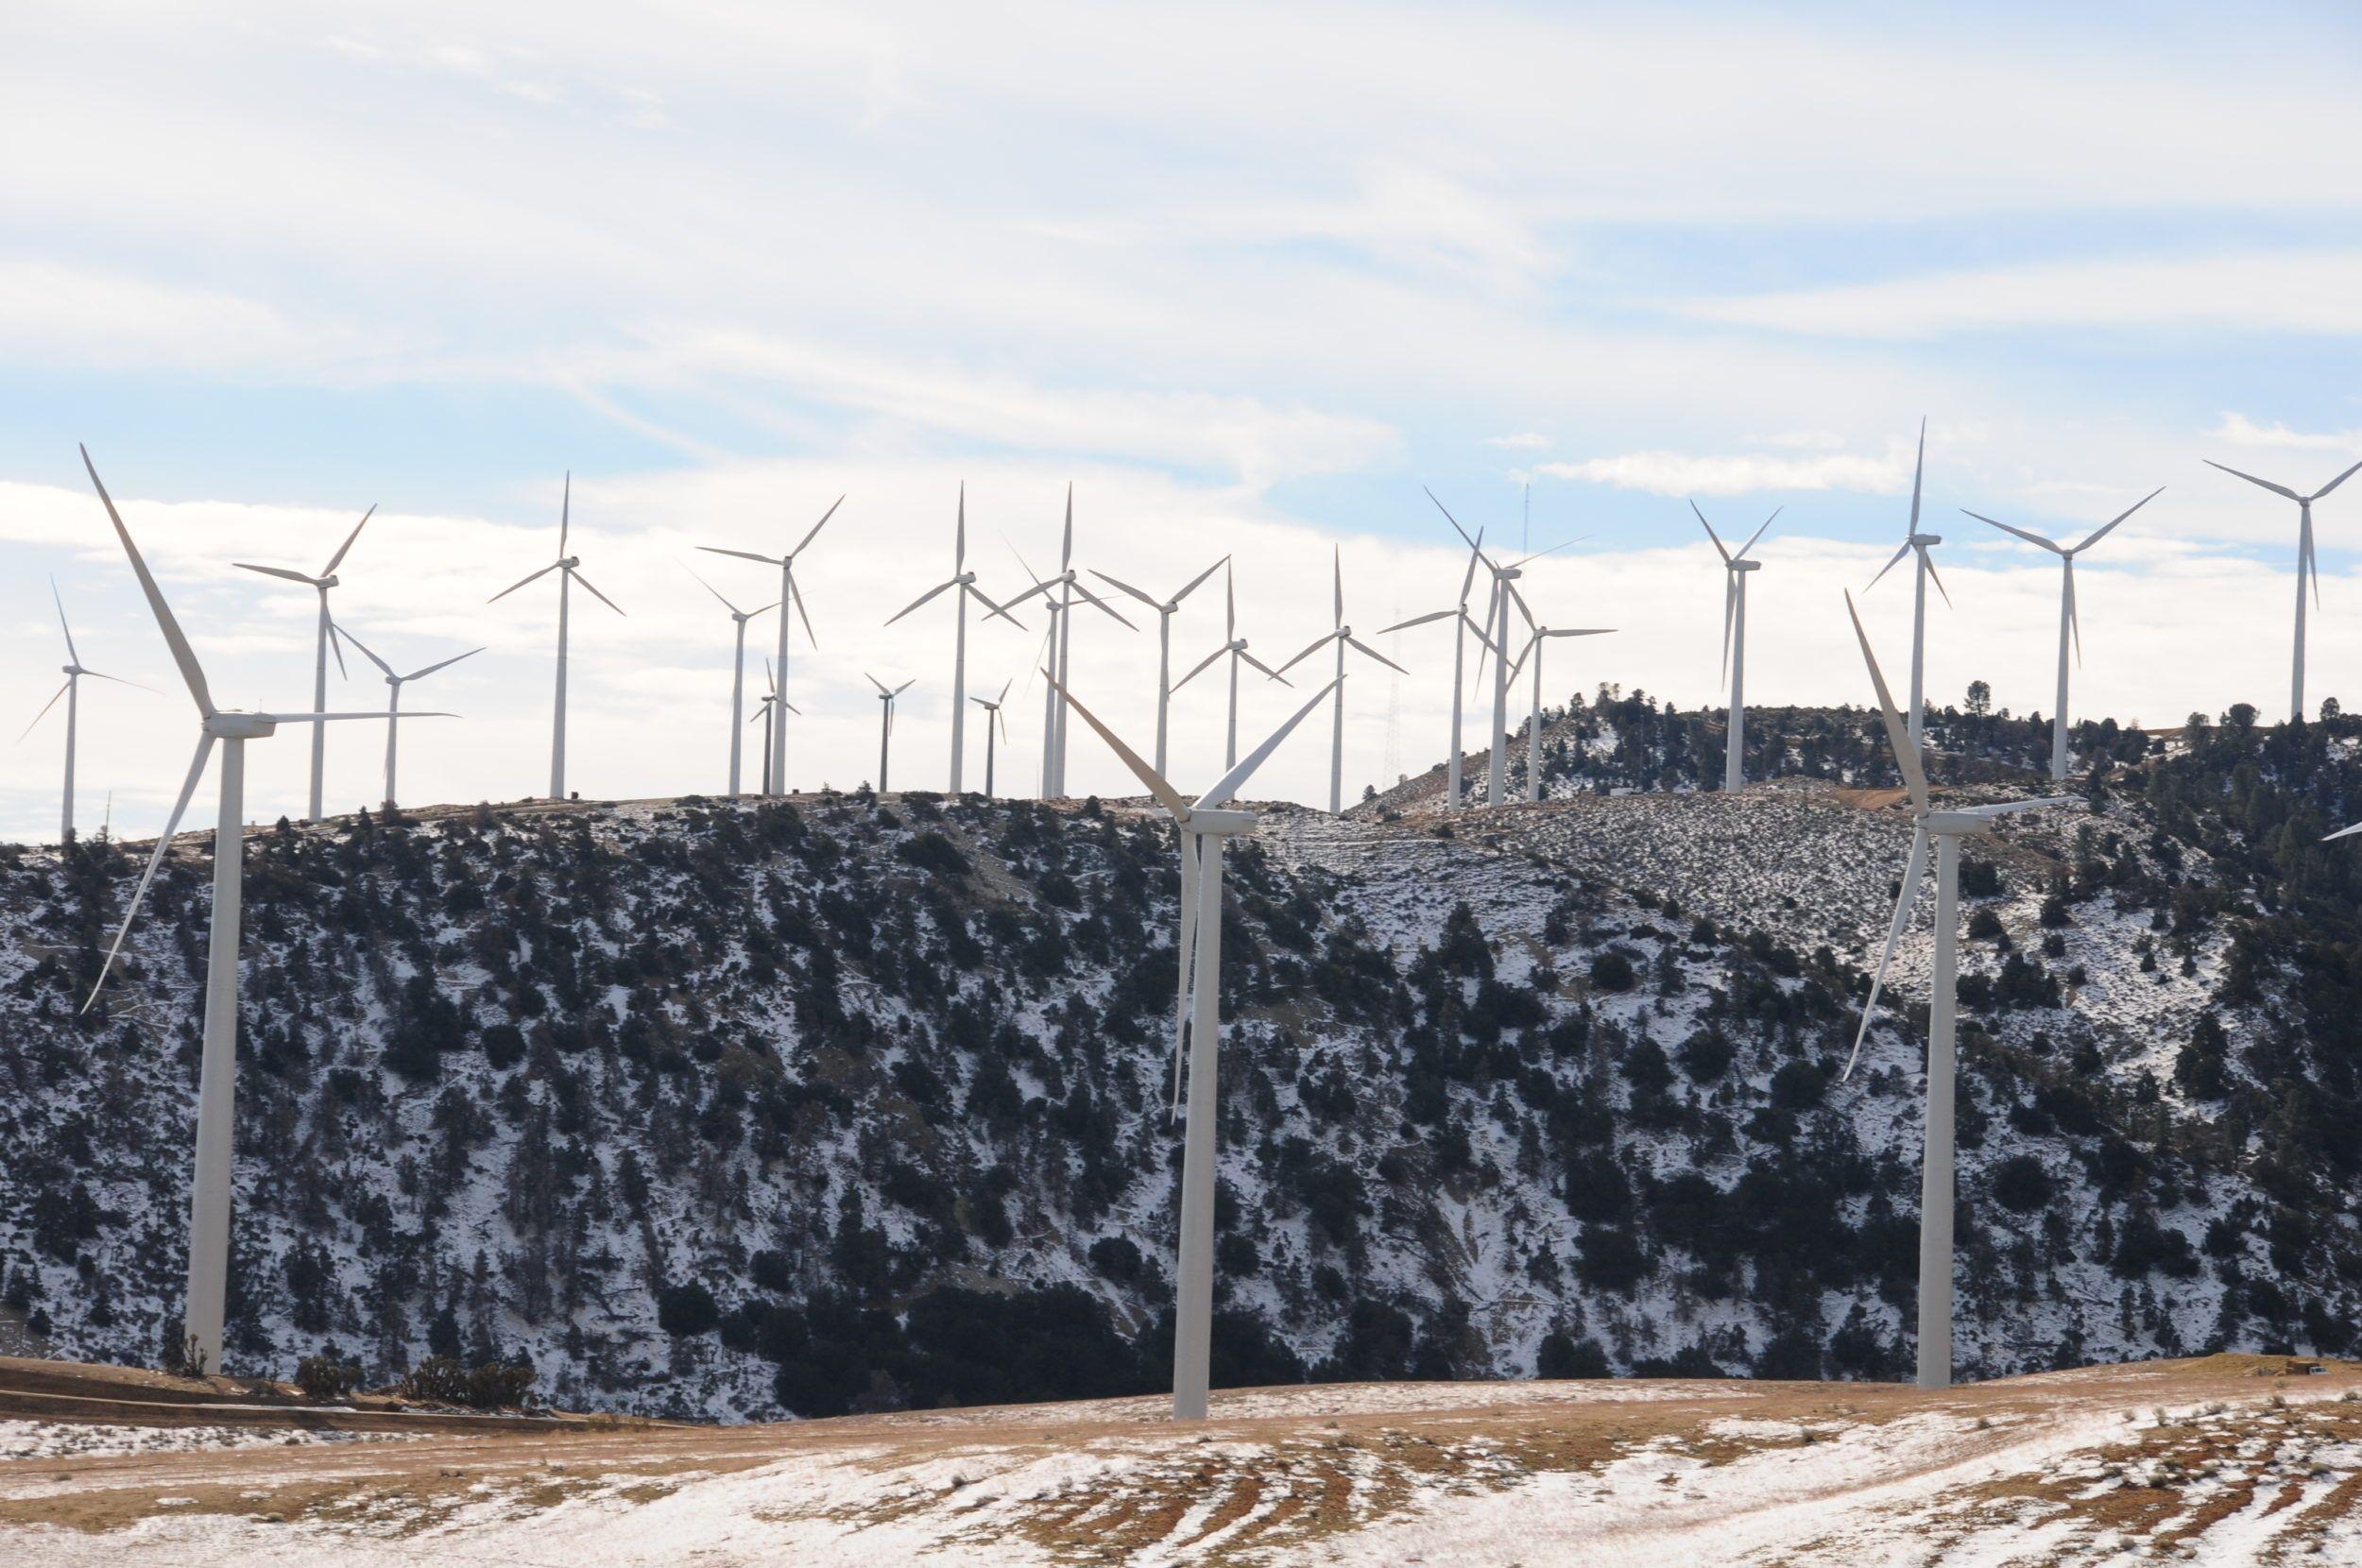 Wind farm wind turbine gearbox service agreement